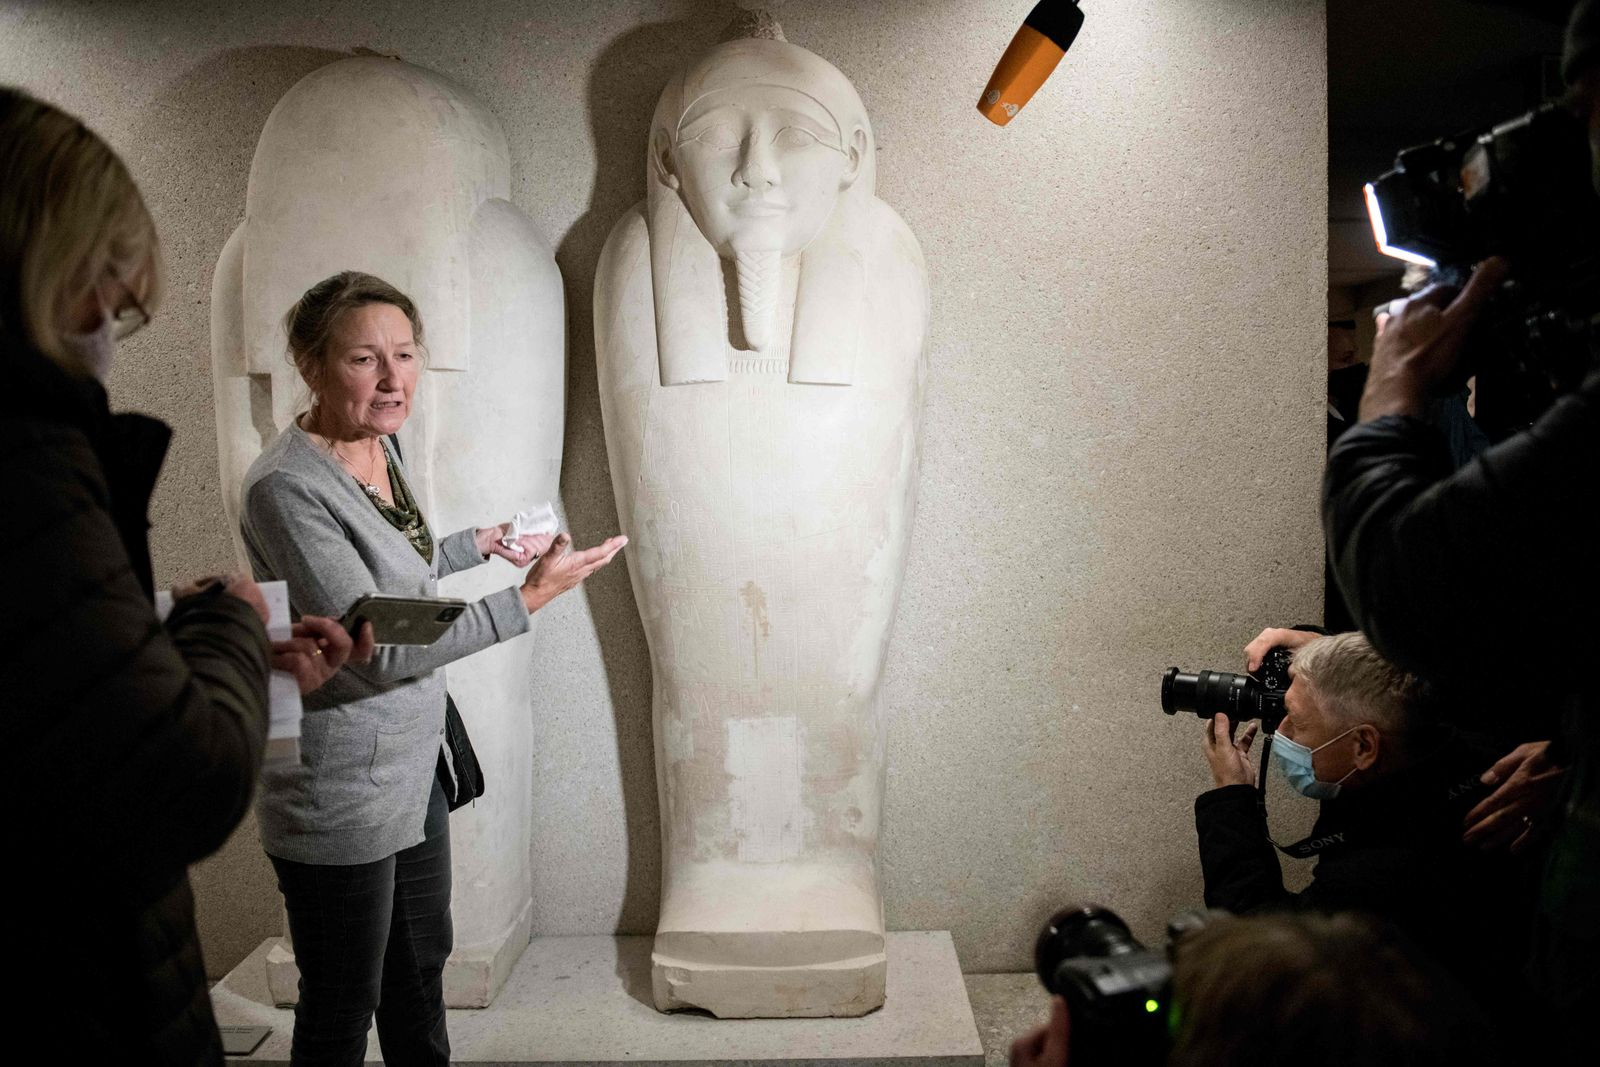 GERMANY-CULTURE-MUSEUM-CRIME-VANDALISM